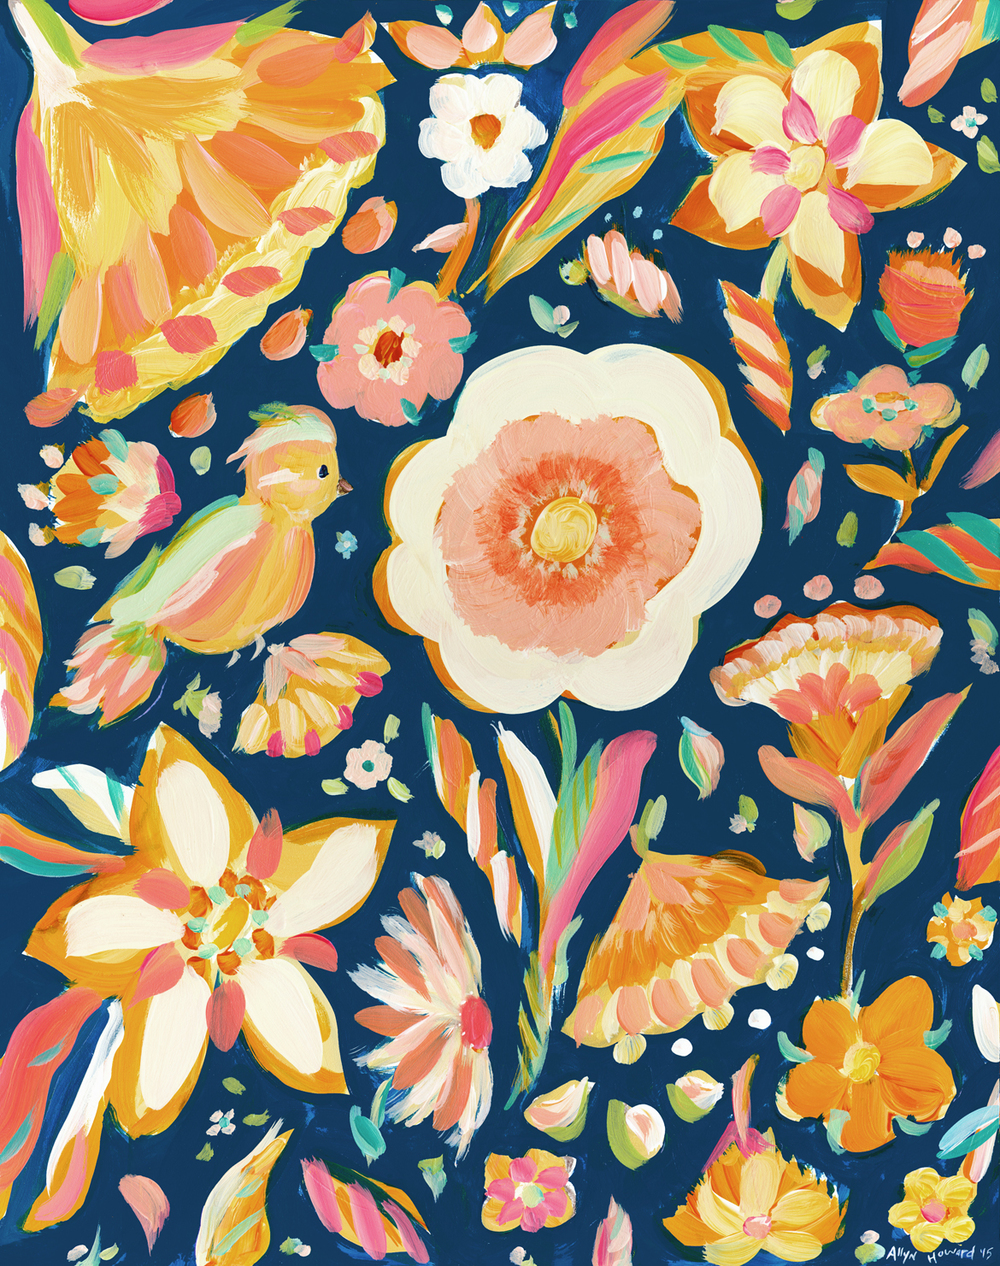 5 Tropical_delight_floral_Allyn_Howard.jpg